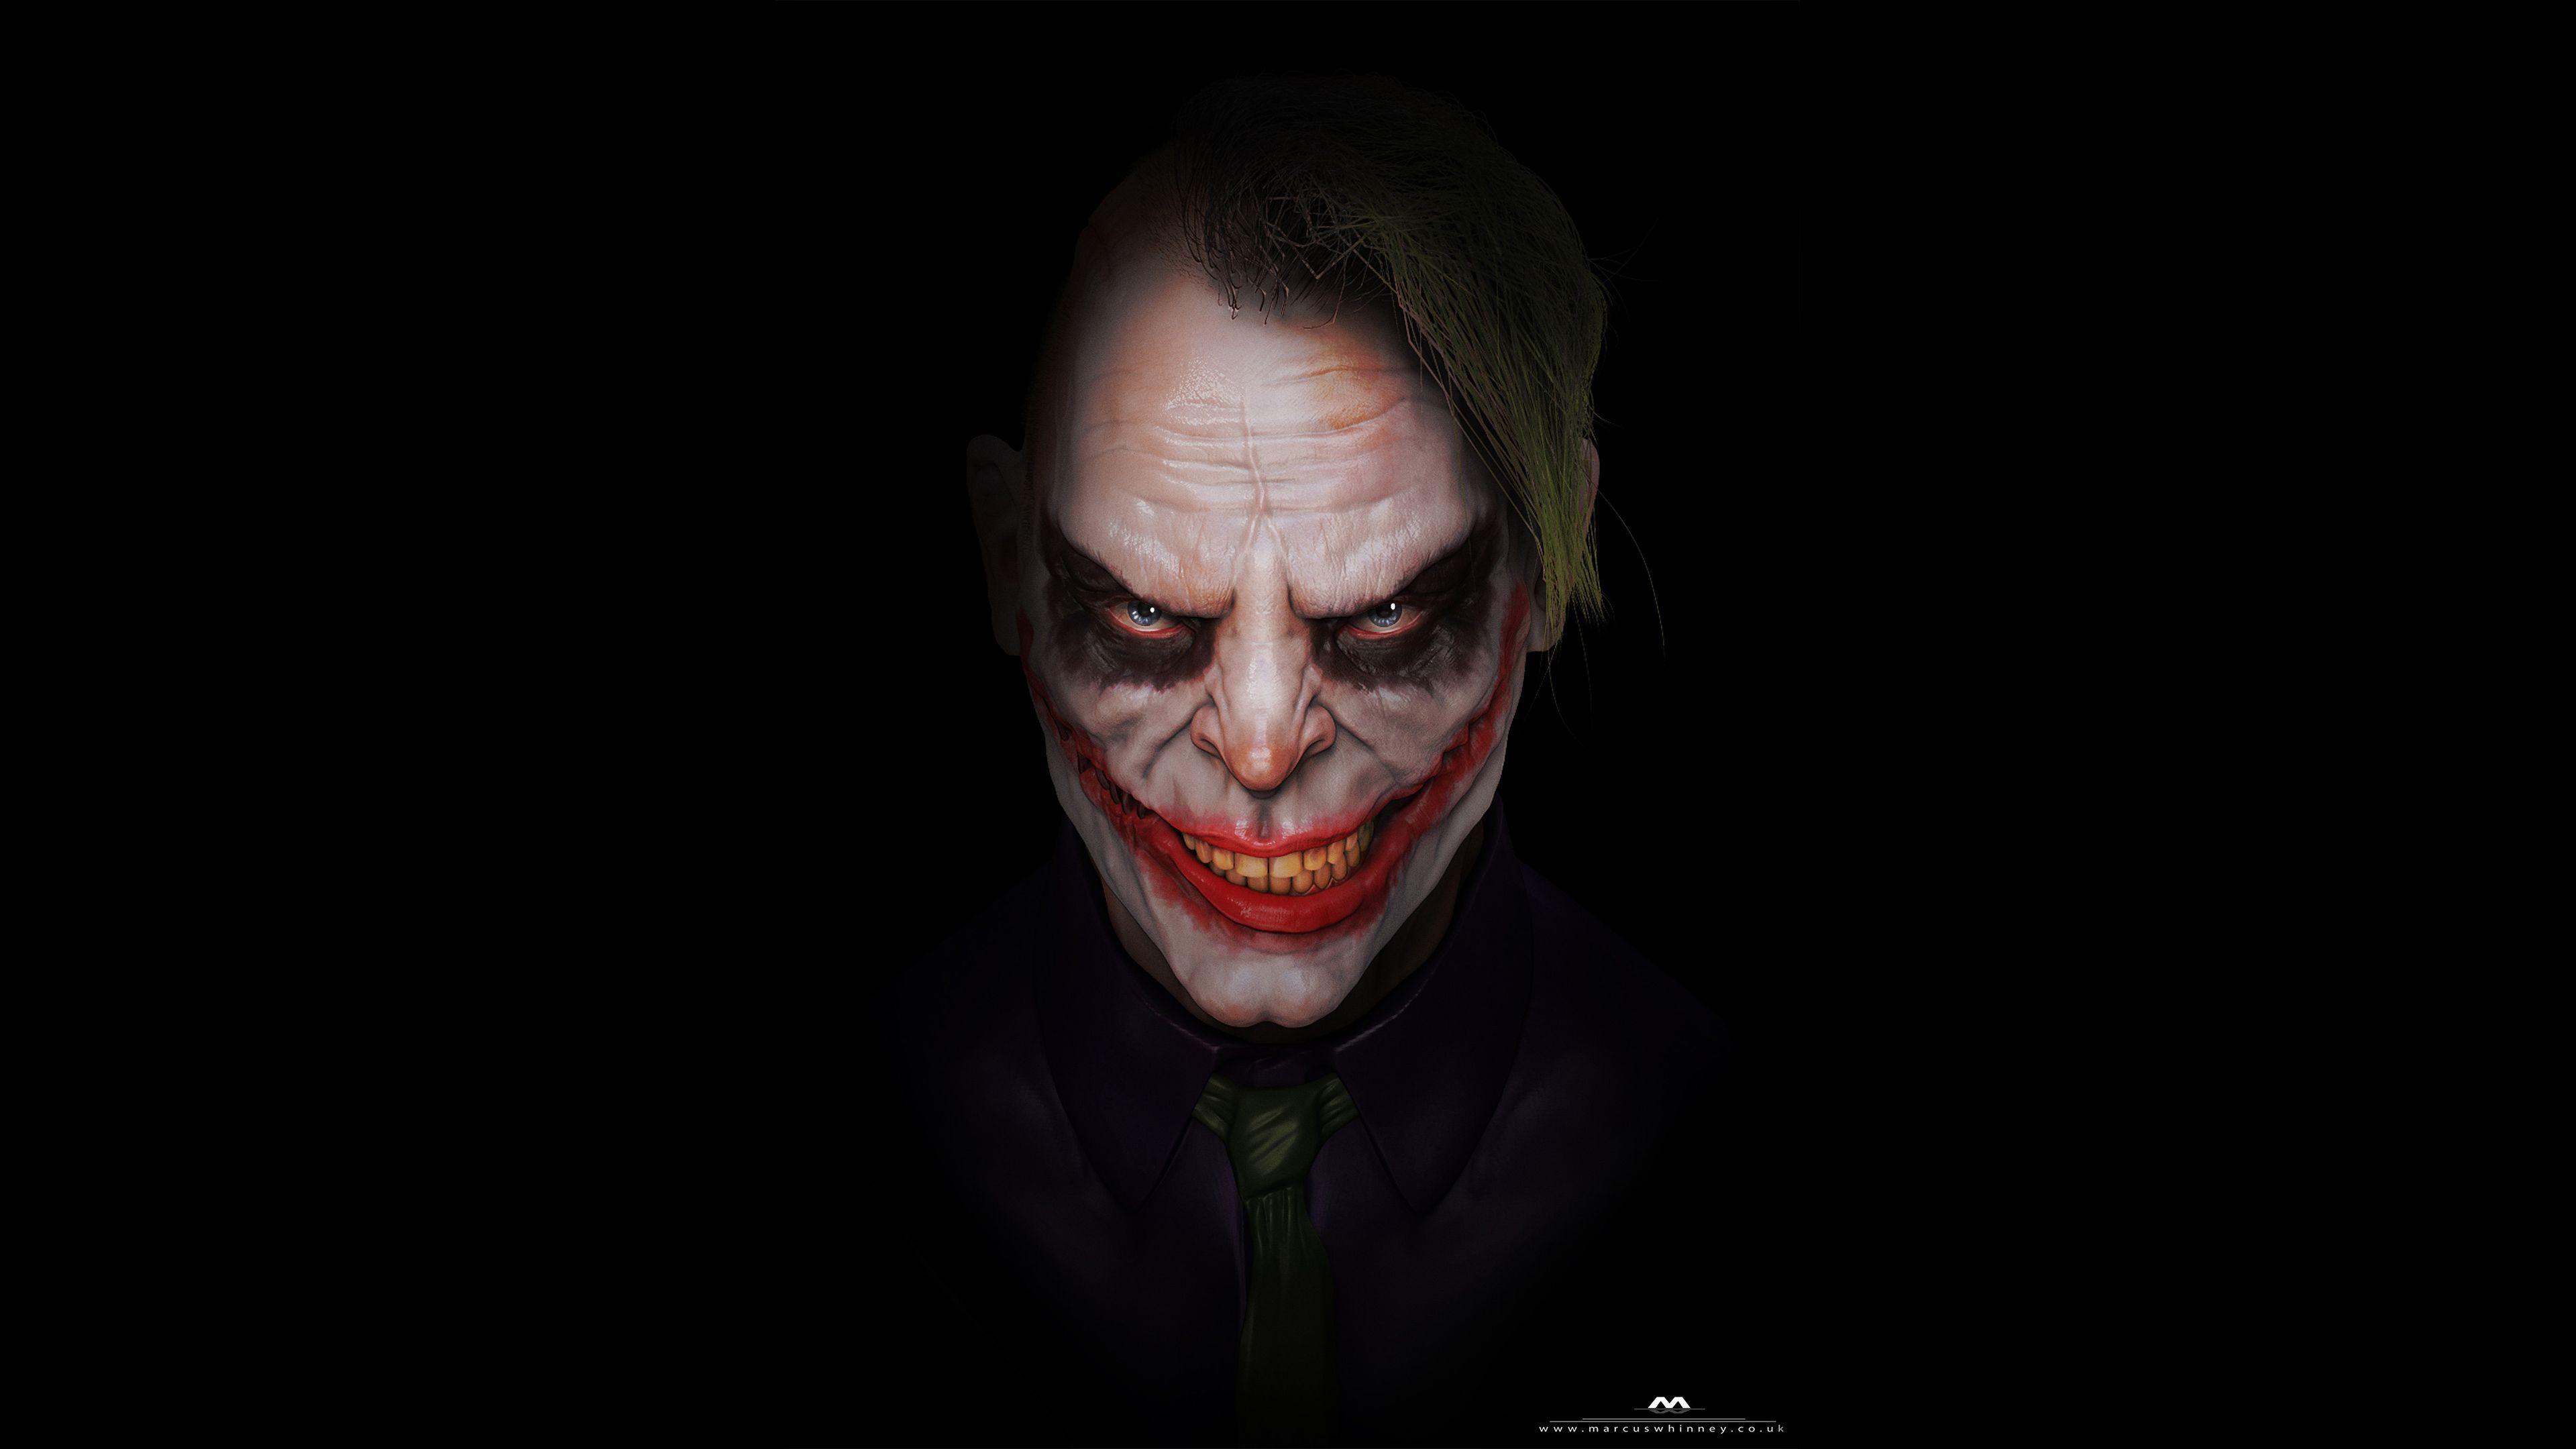 Scary Joker Wallpapers Top Free Scary Joker Backgrounds Wallpaperaccess